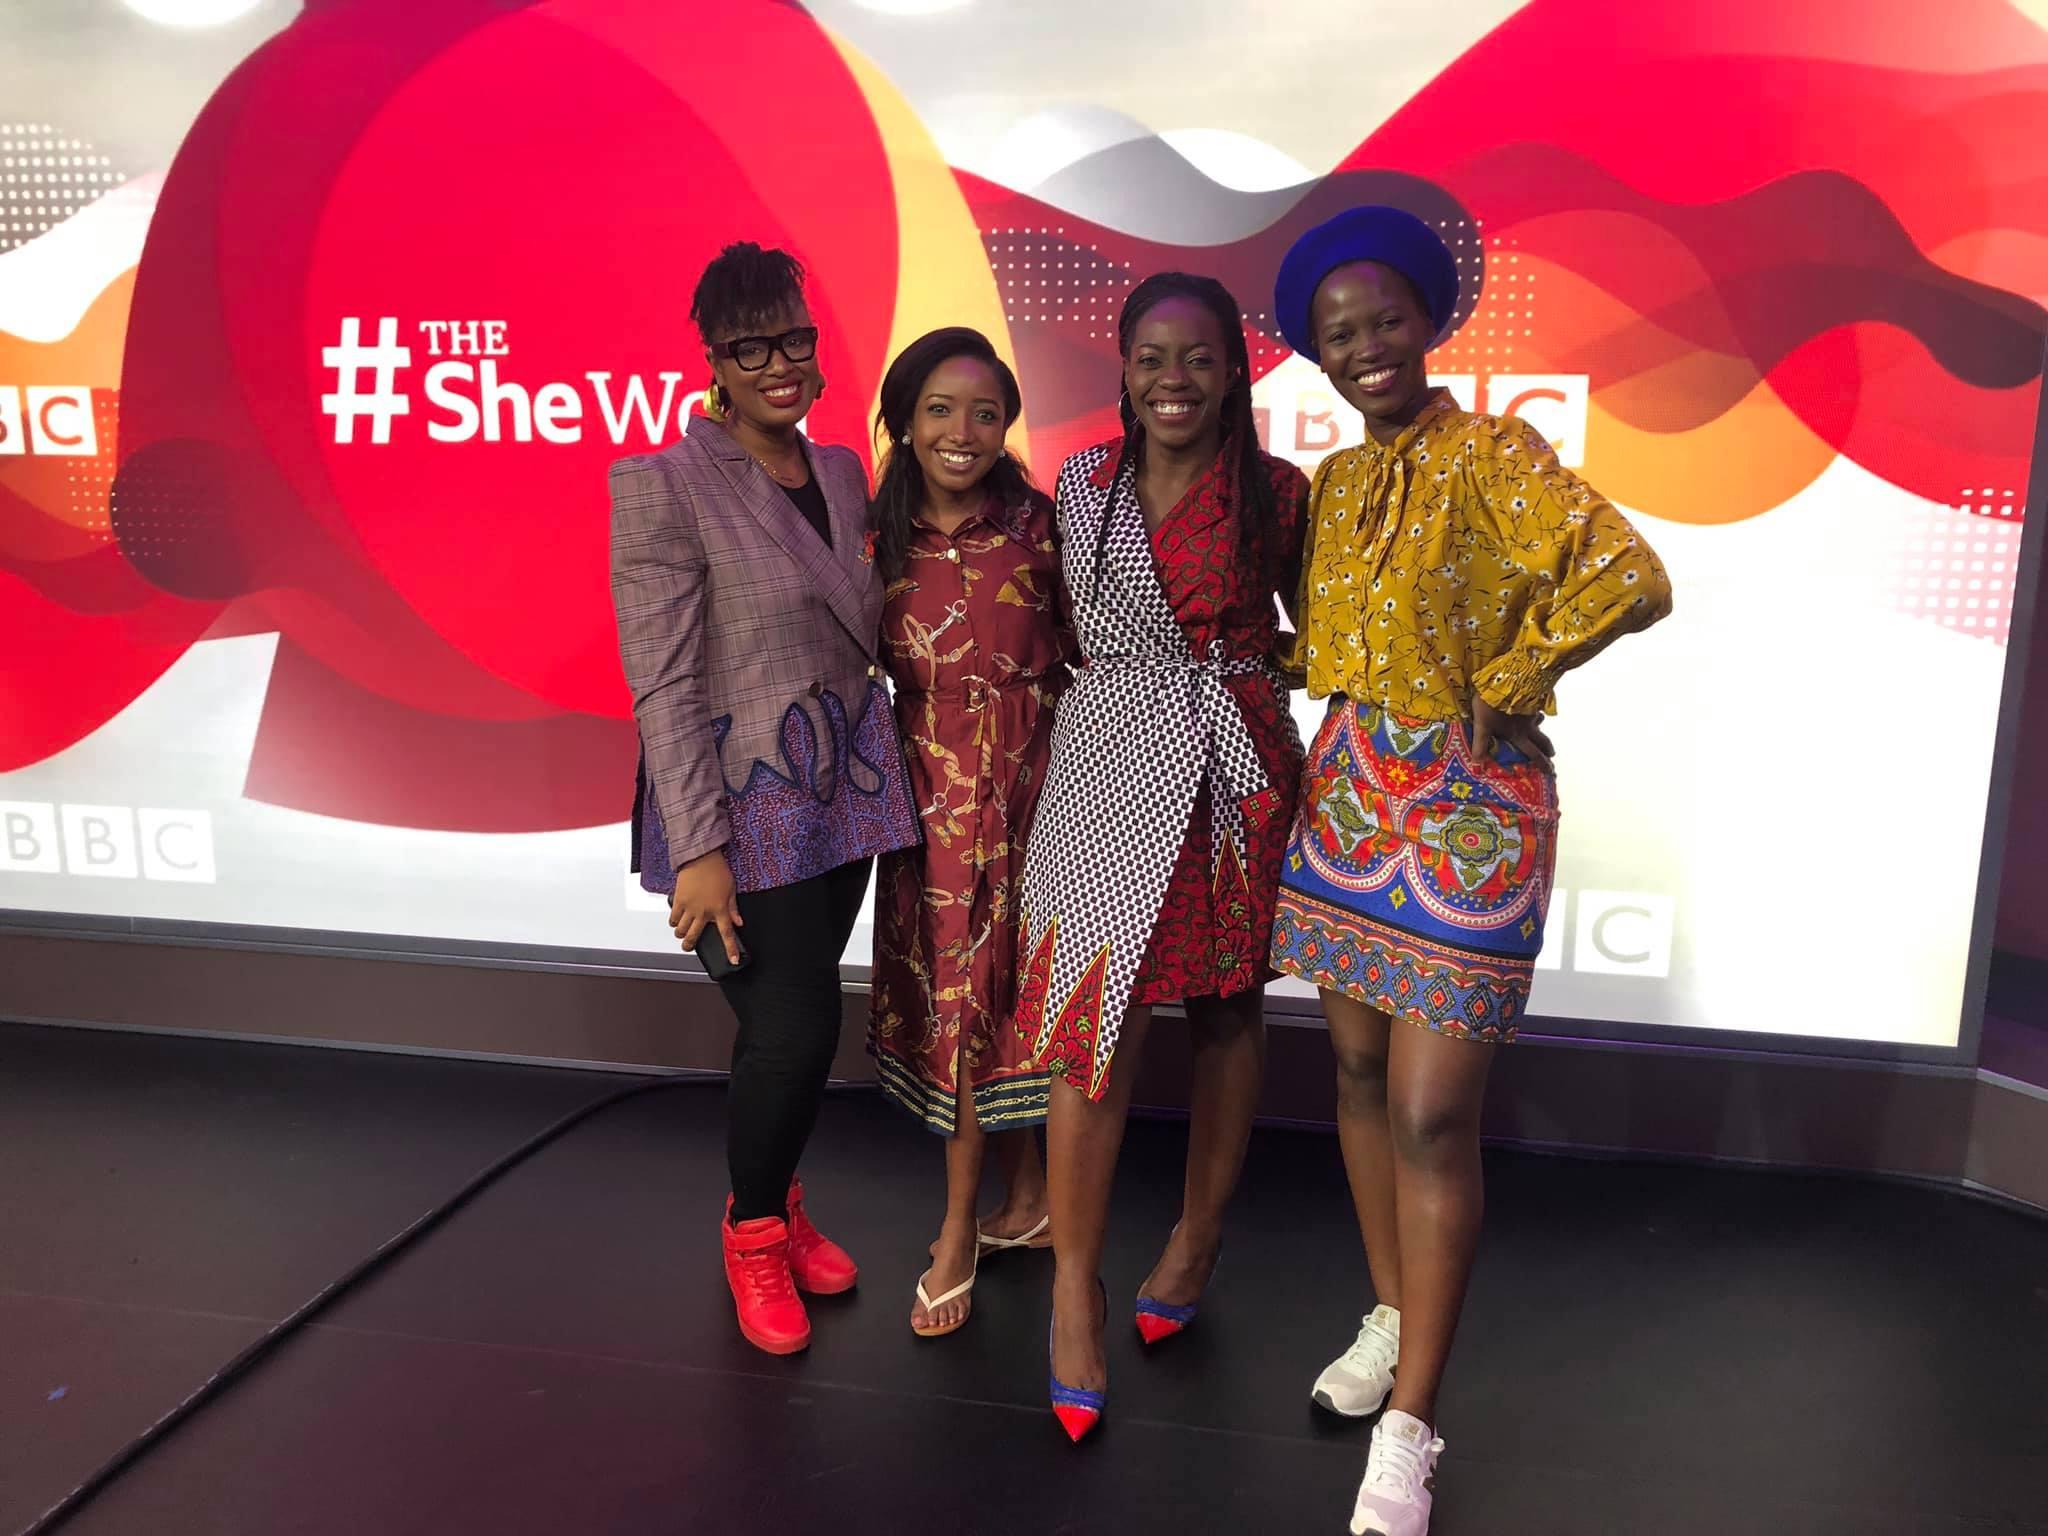 with The She Word co-panelists Anita Nderu (Kenya), Sade Ladipo (Nigeria), and Mandy Amandine (Burundi) at BBC Africa studios in Nairobi, Kenya